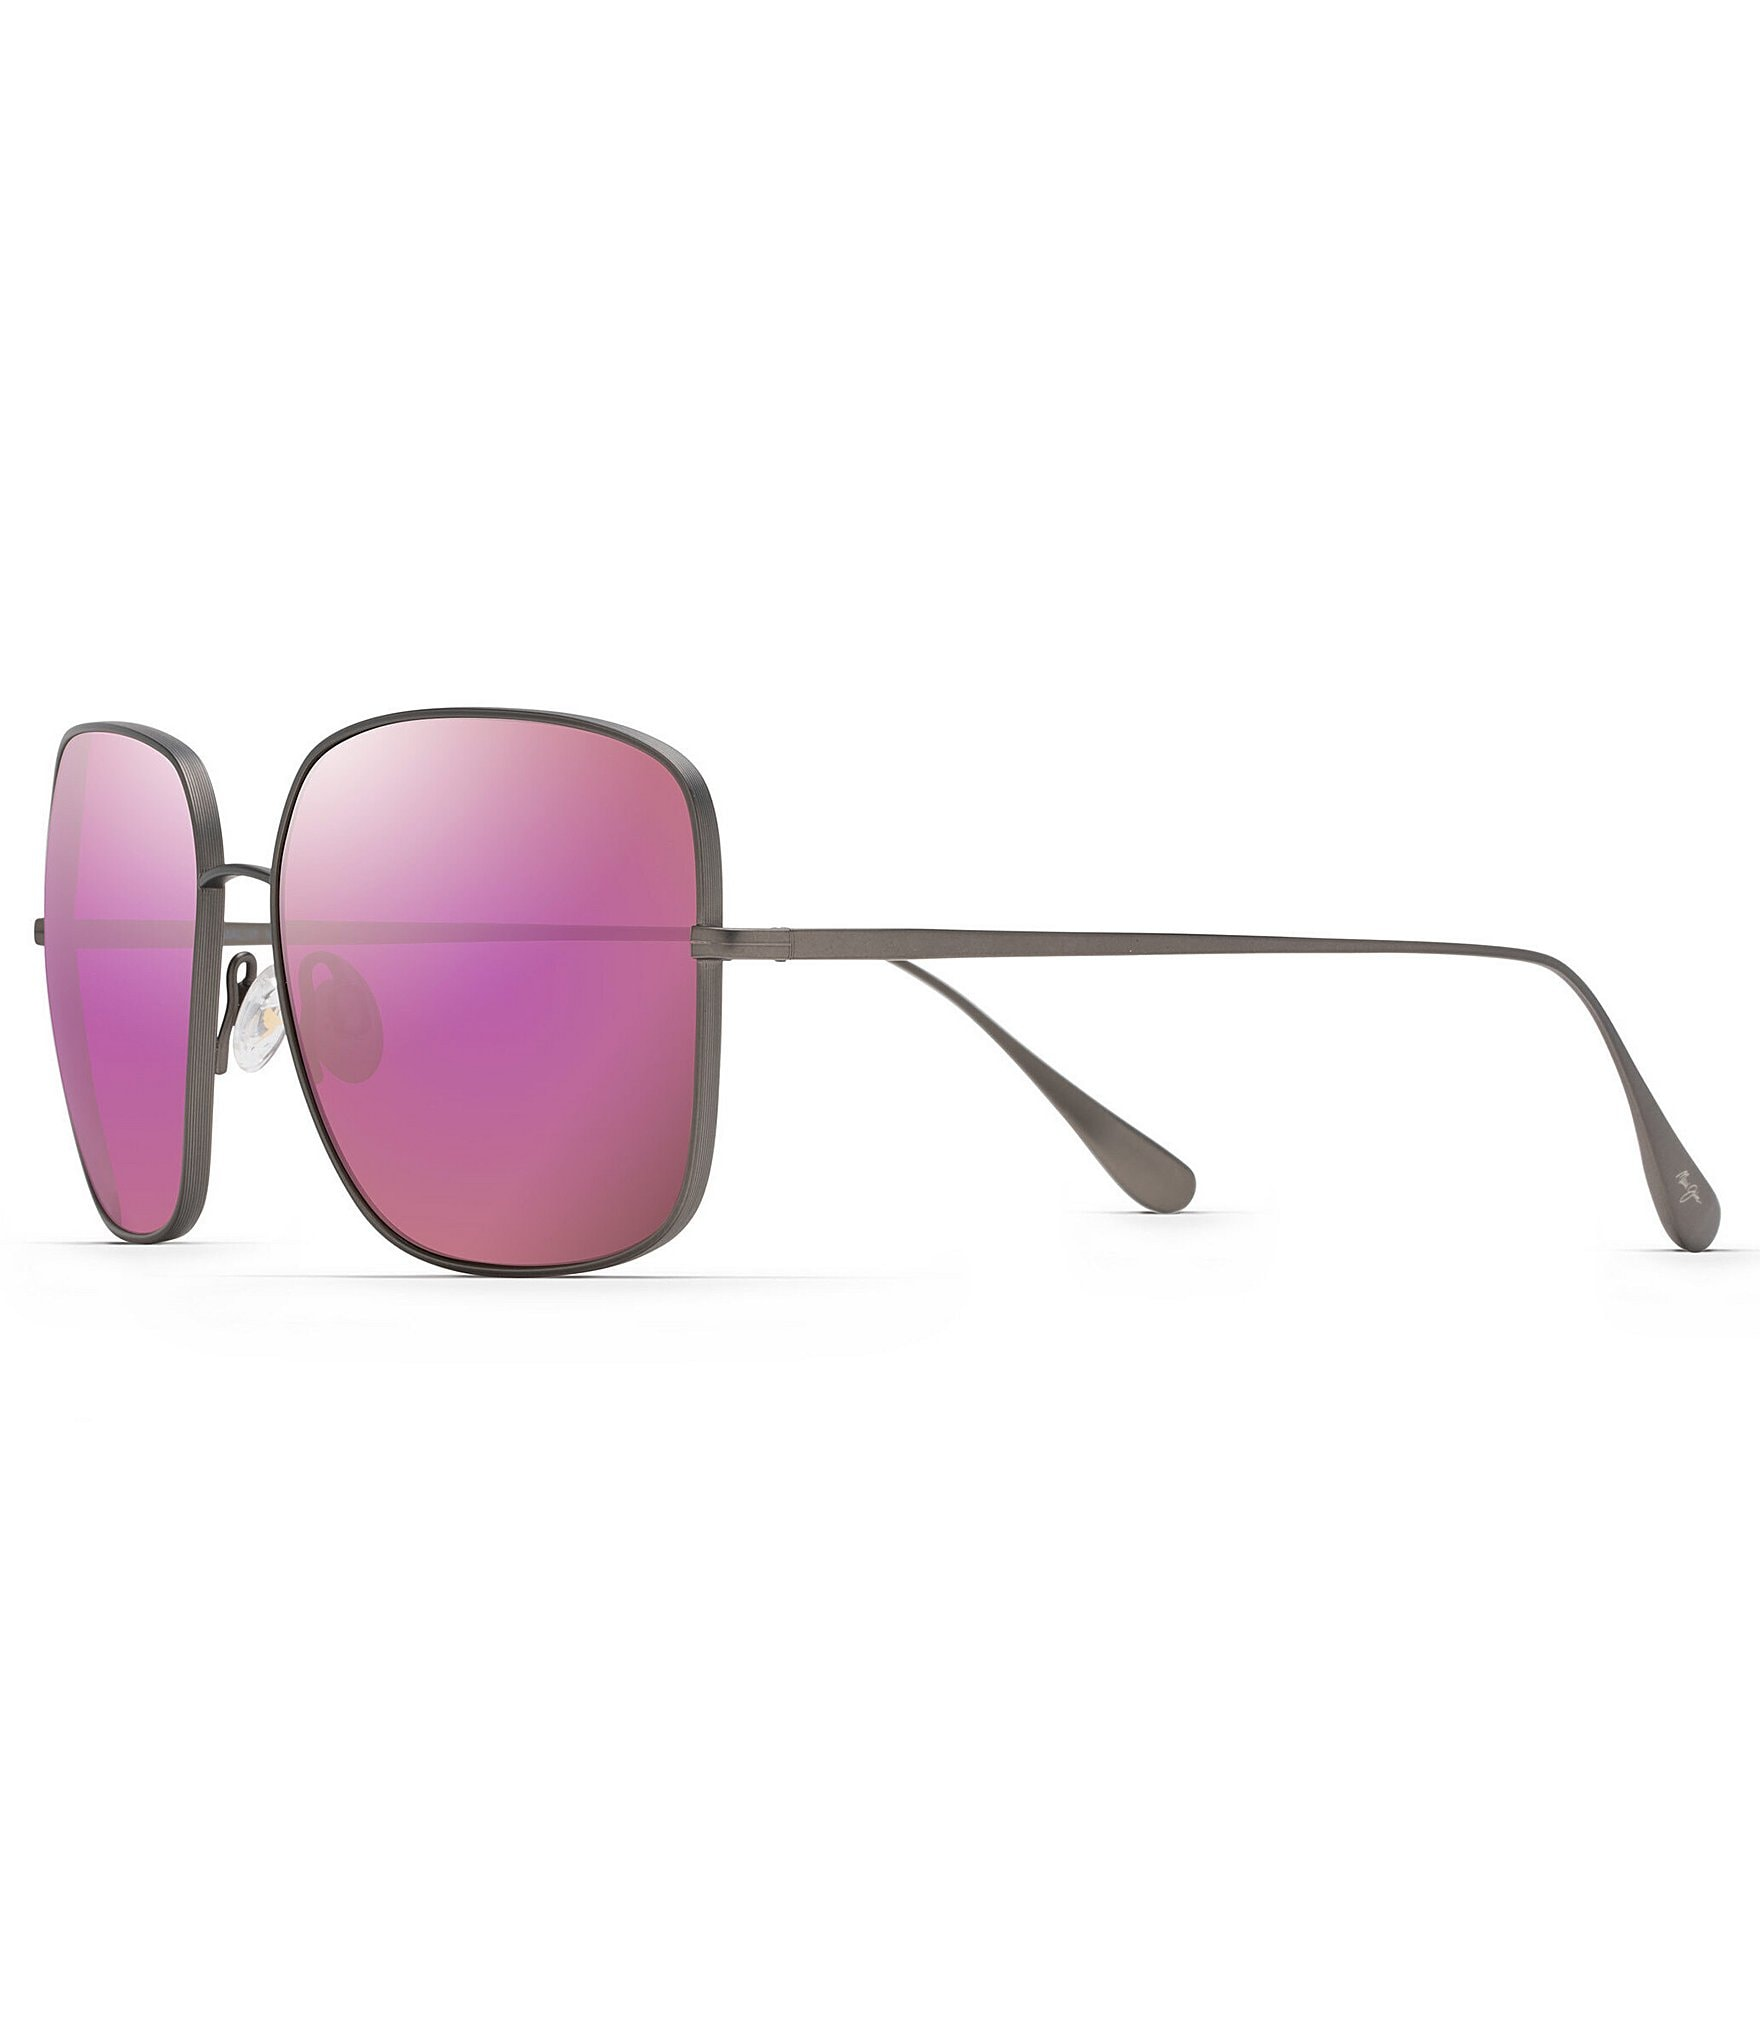 c8ad567f9bb6e Pink Men s Polarized Sunglasses